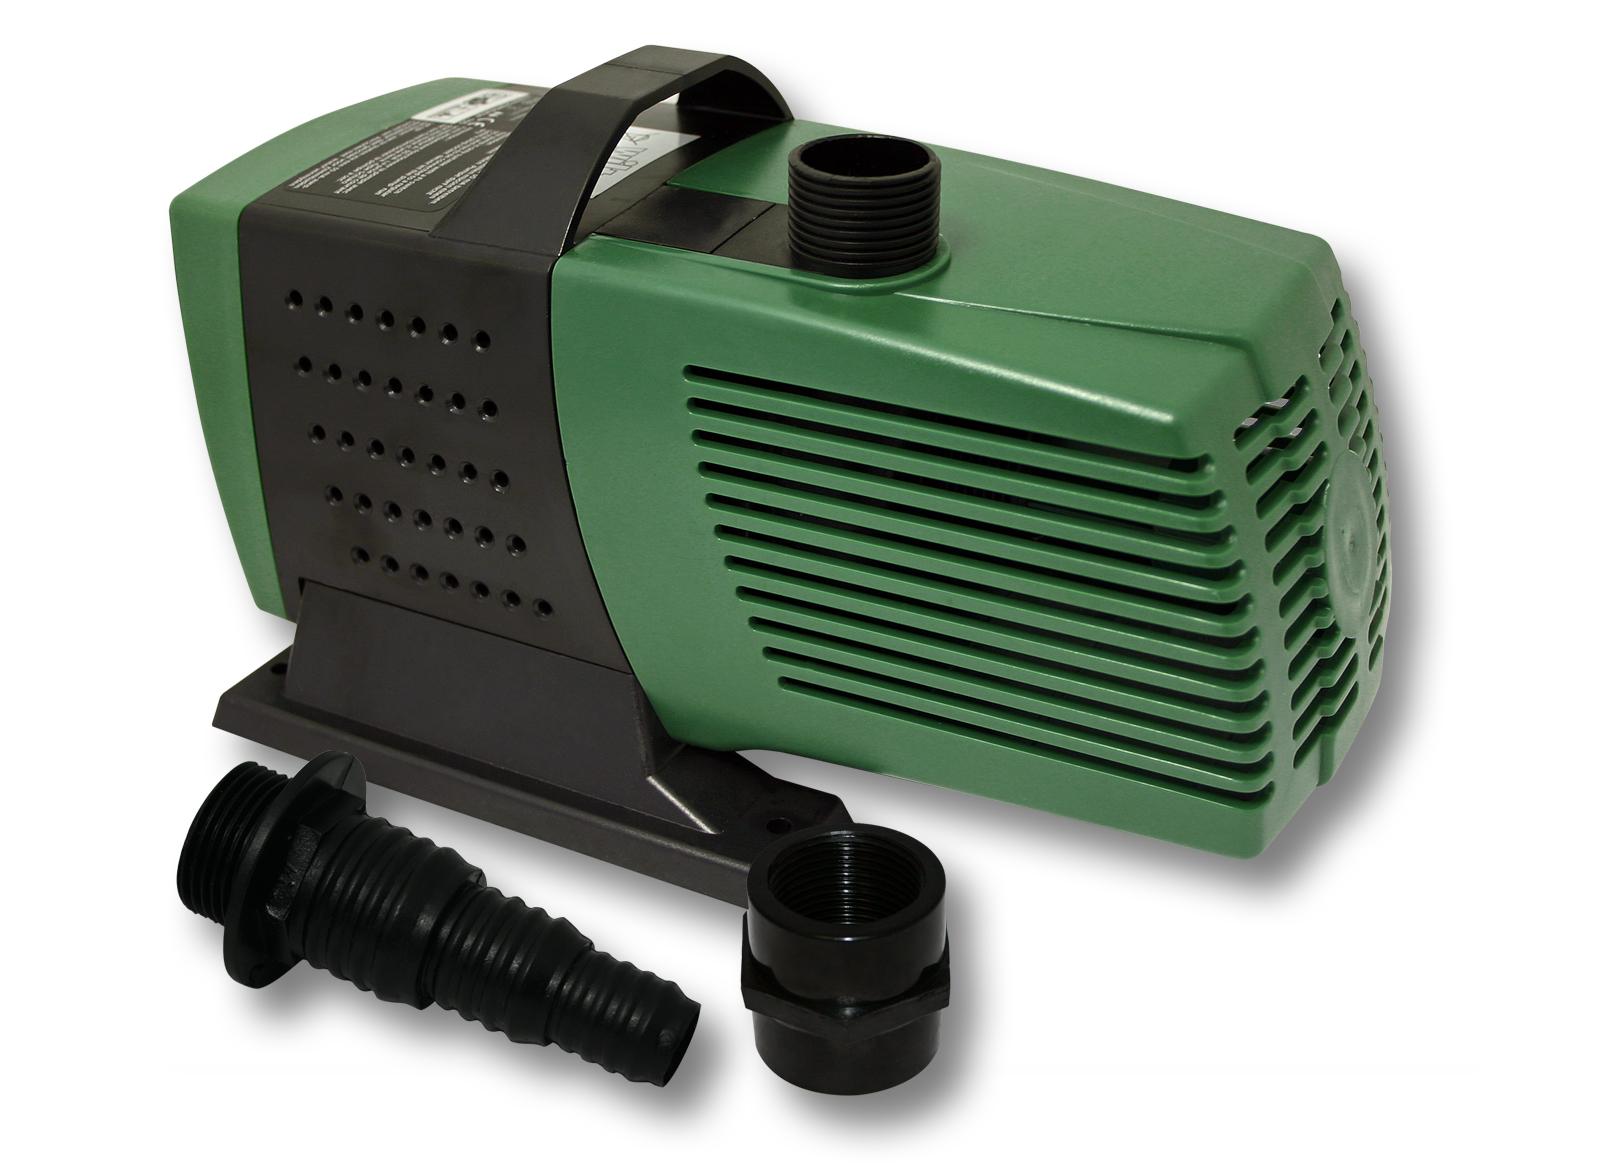 Jebao 10000l h 135w energy saving eco pond pump filter for Used koi pond equipment sale